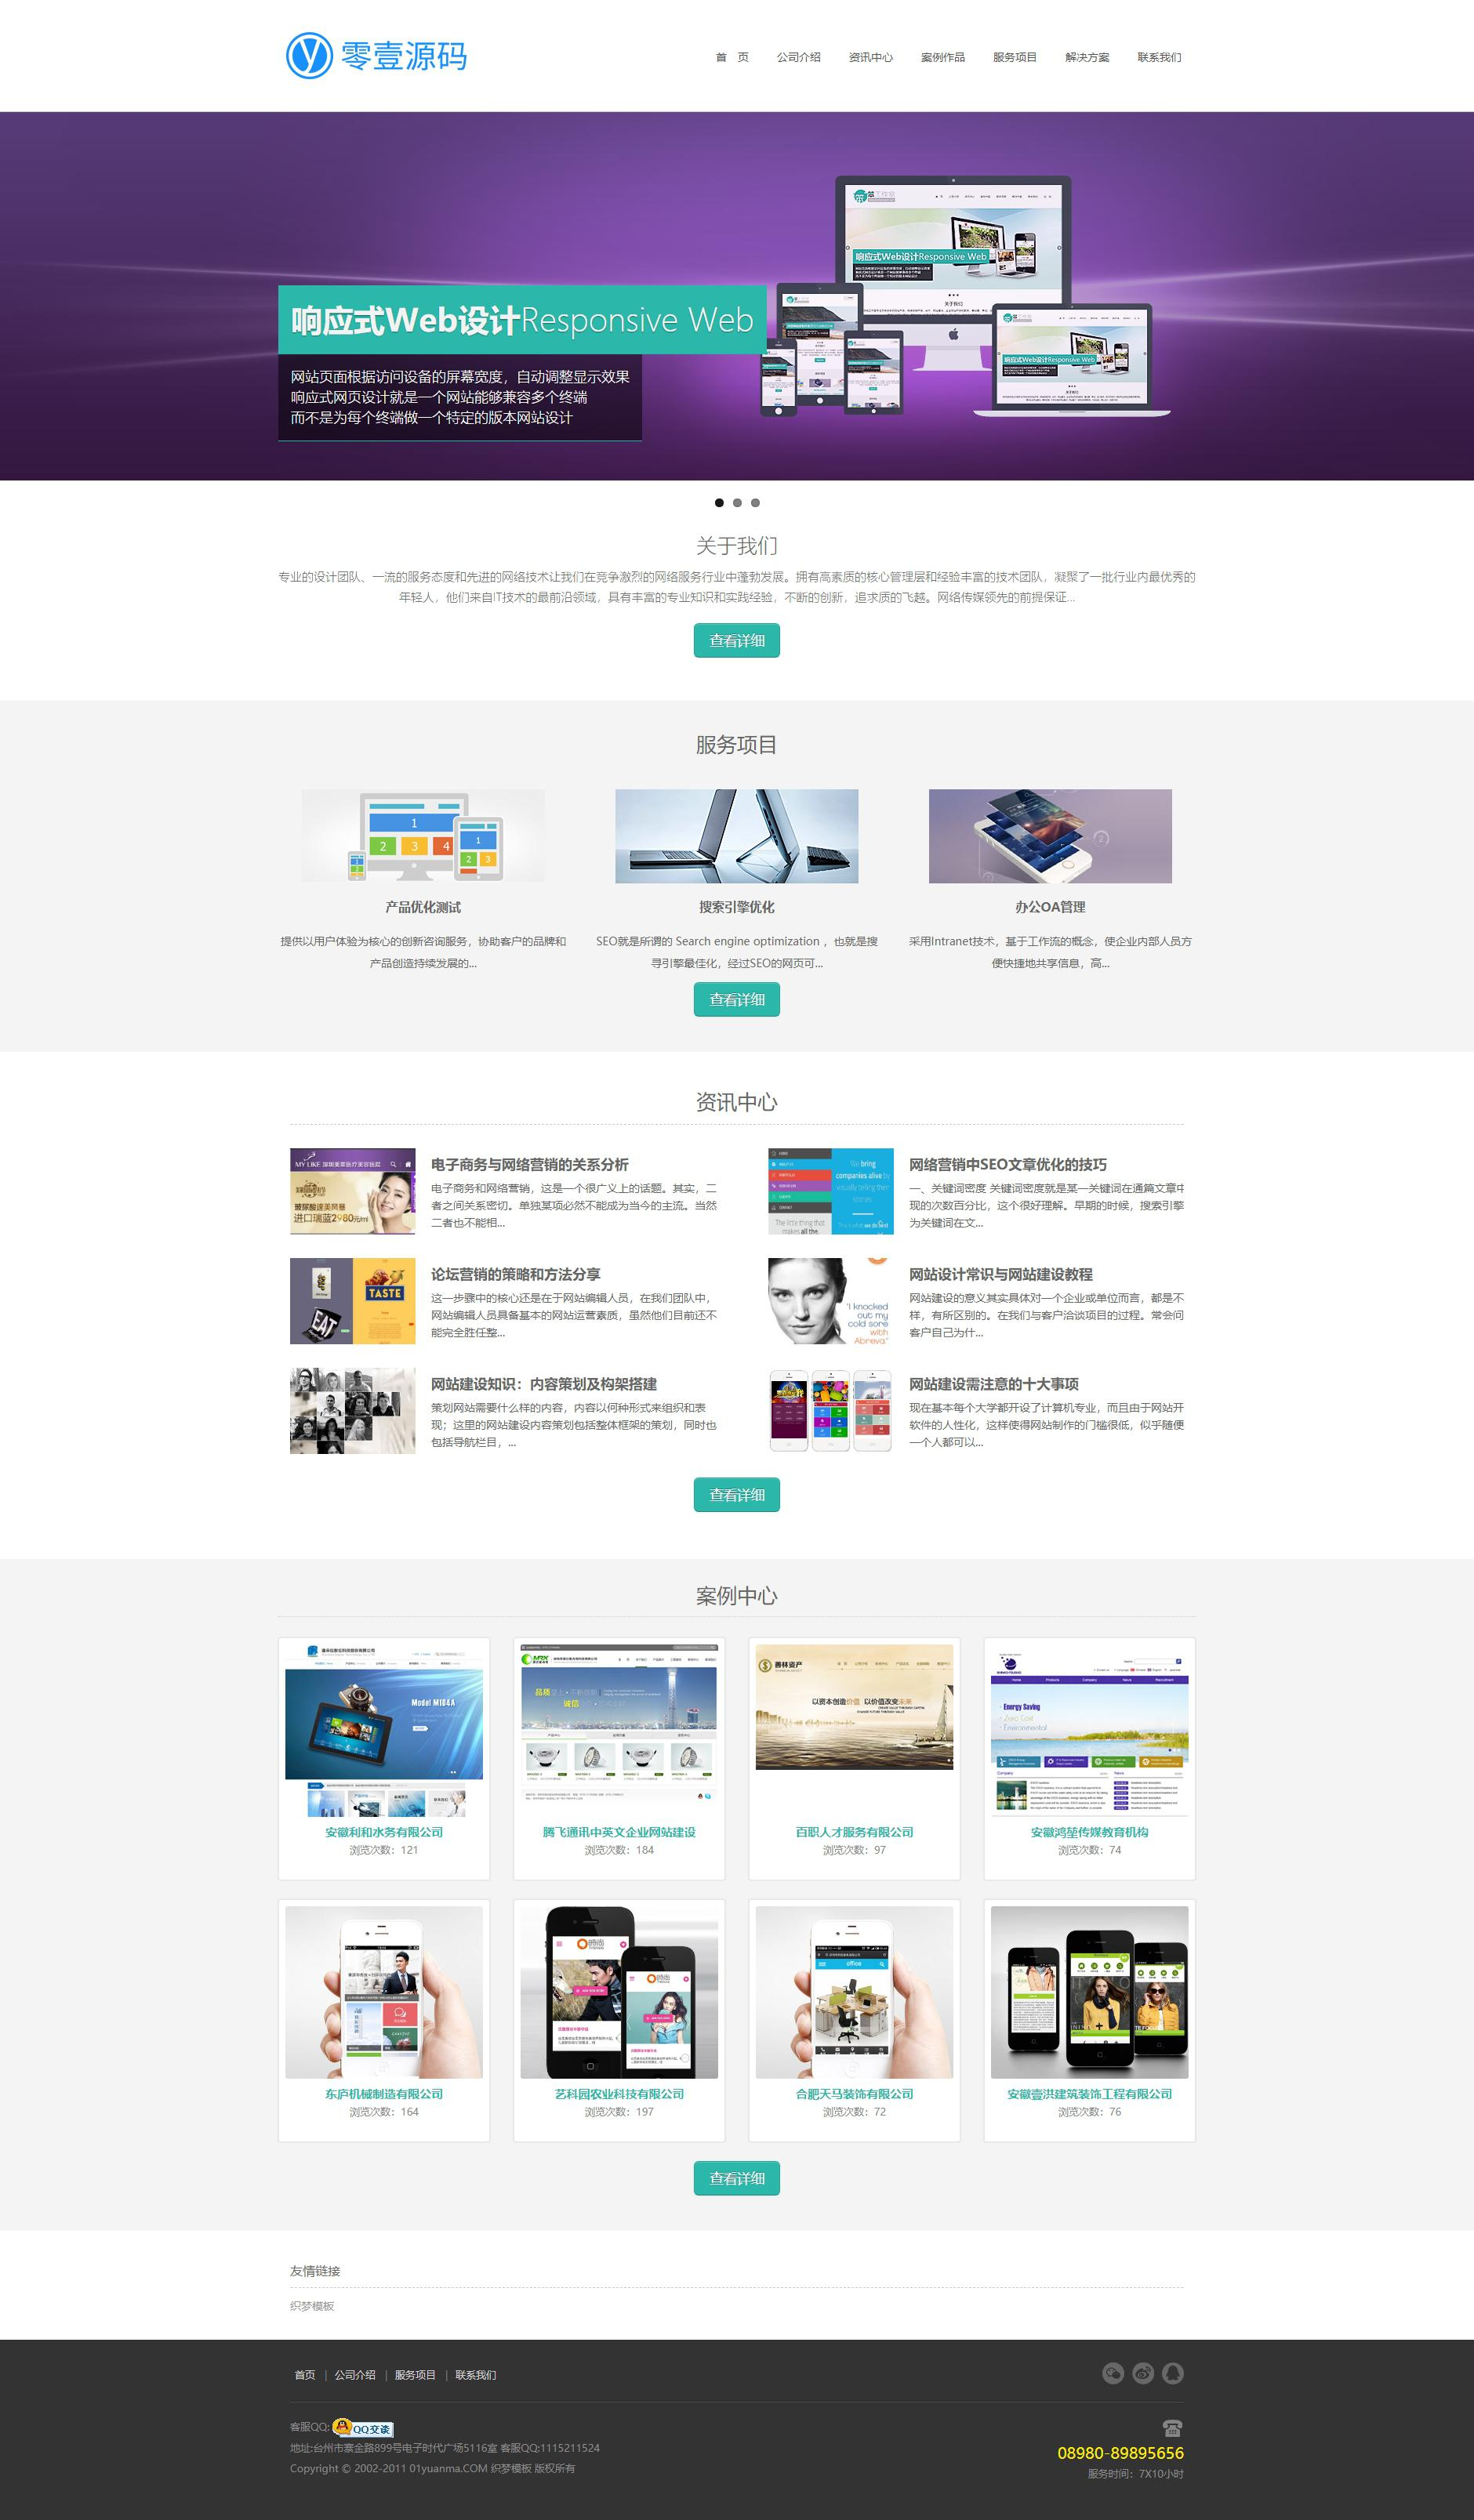 html5响应式自适应网络设计公司网站织梦dedecms模板